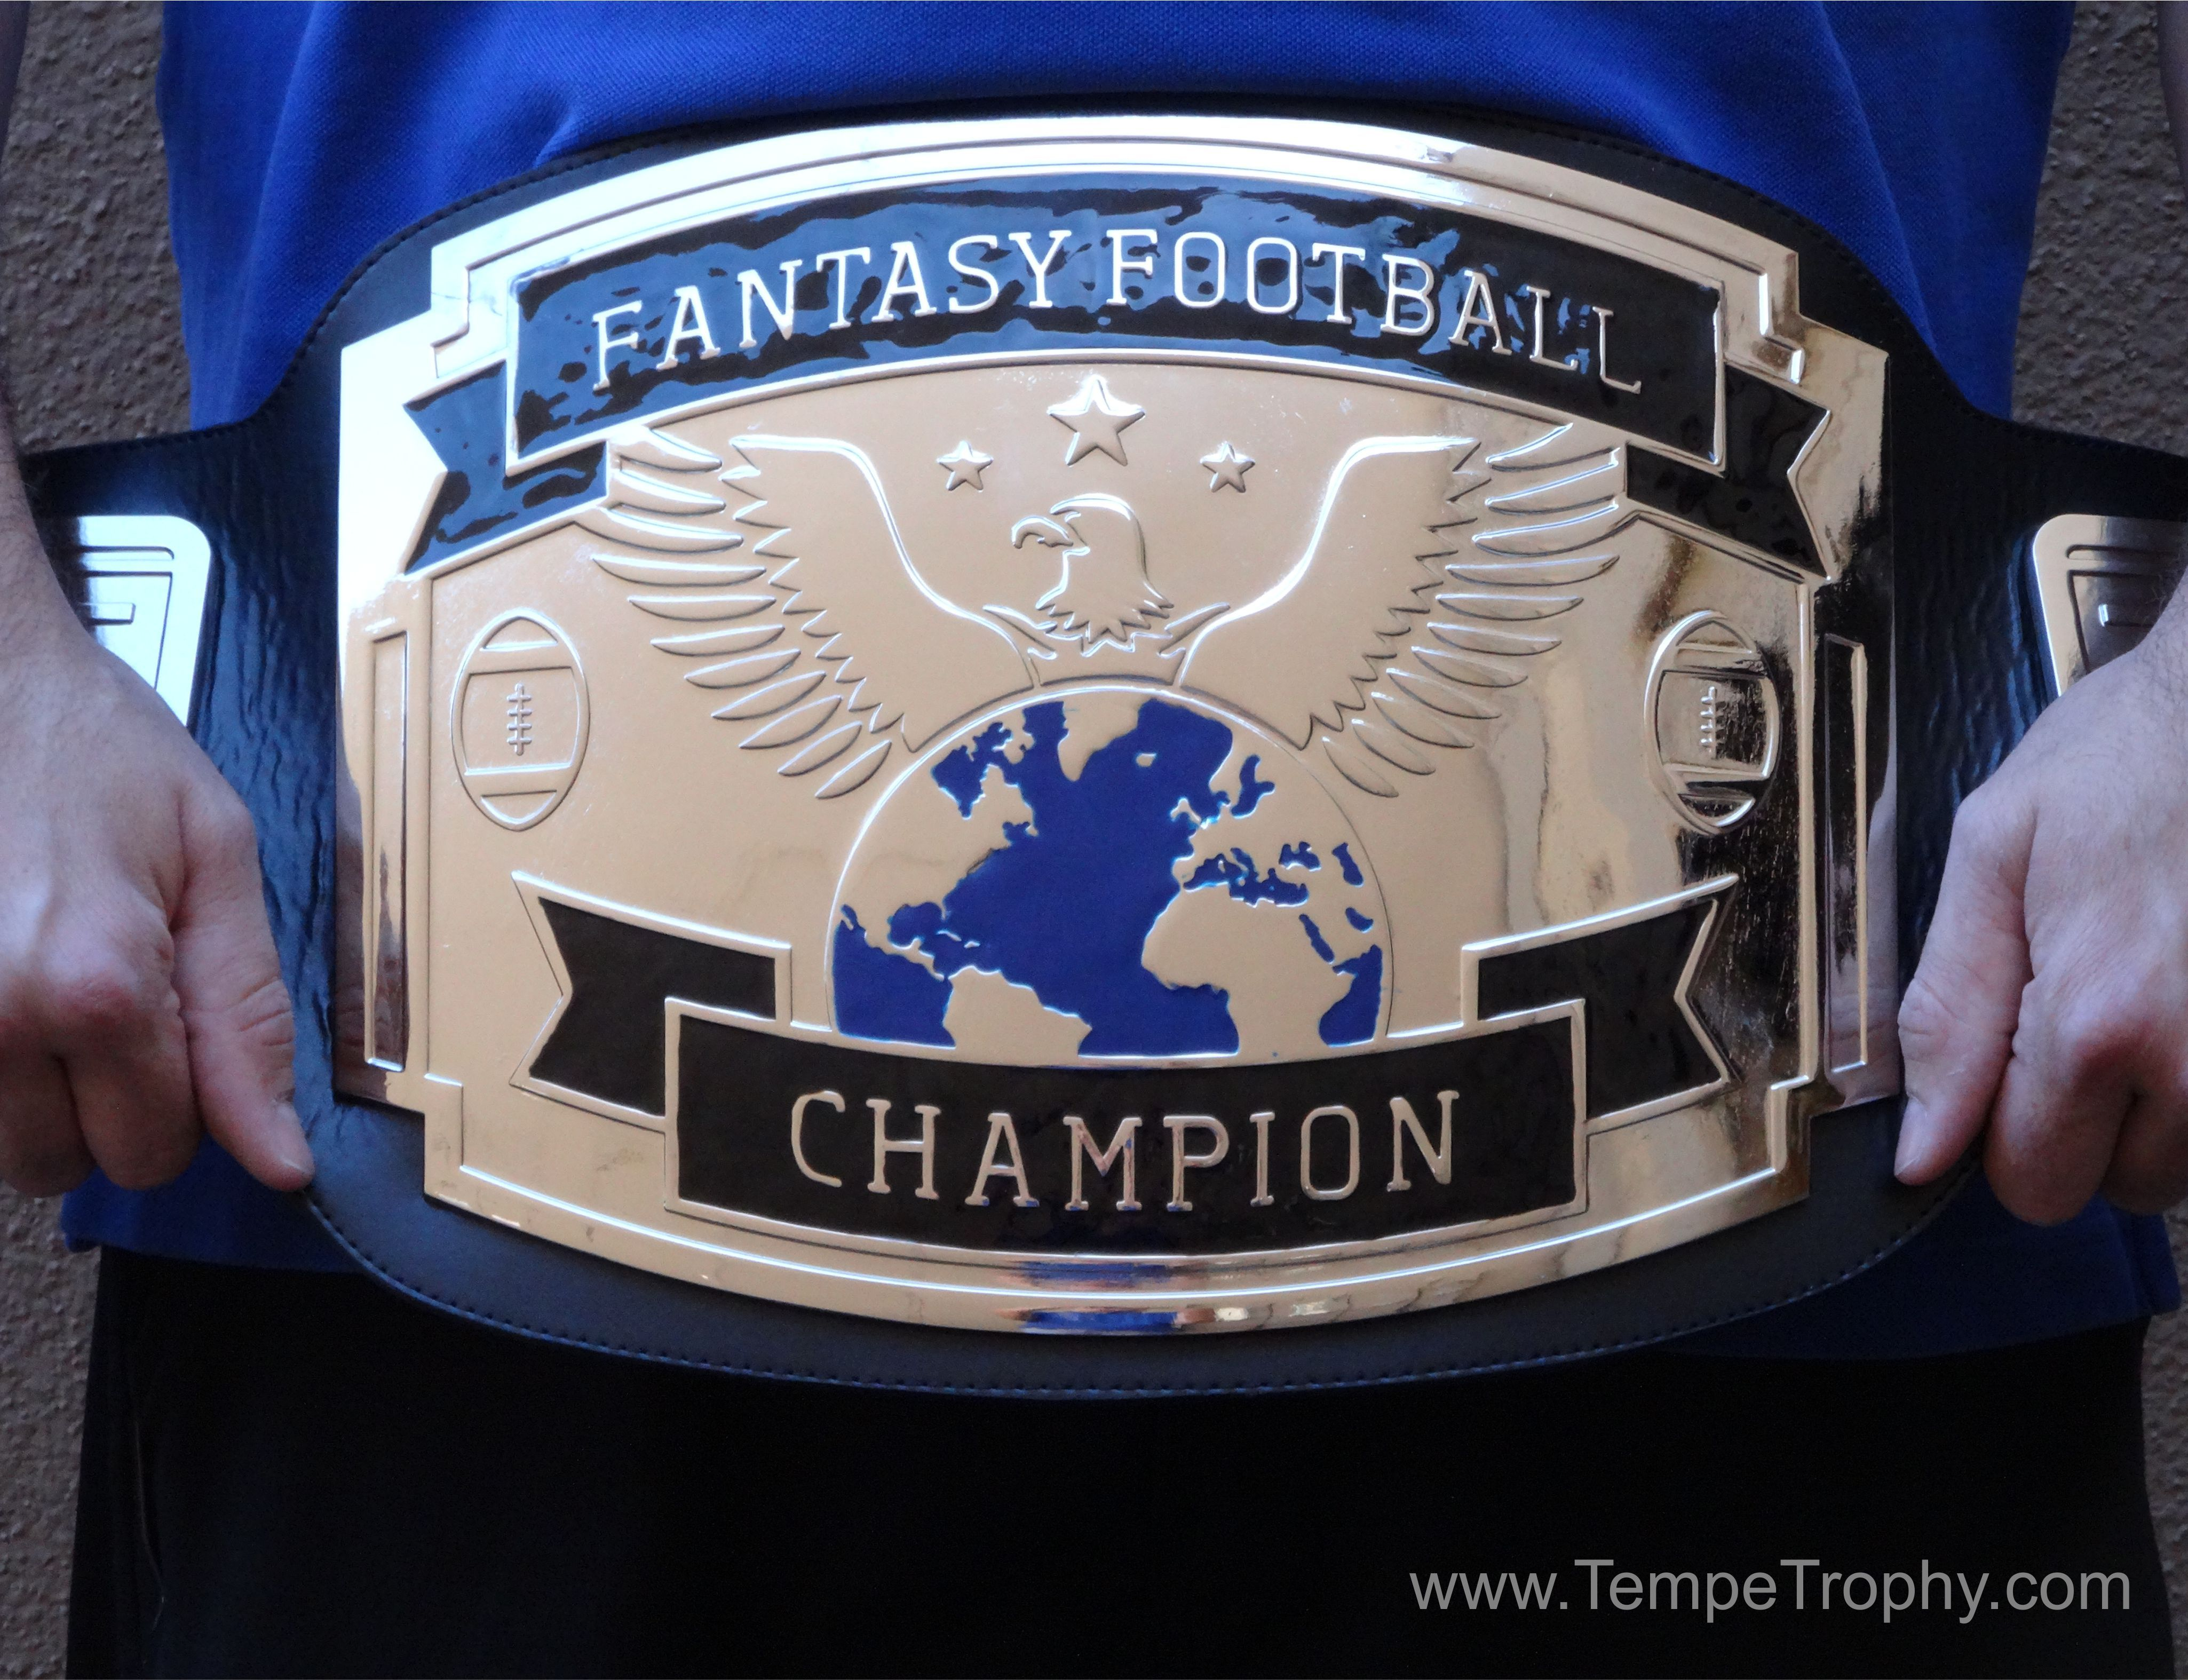 Fantasy football championship wrestling belt its awesome